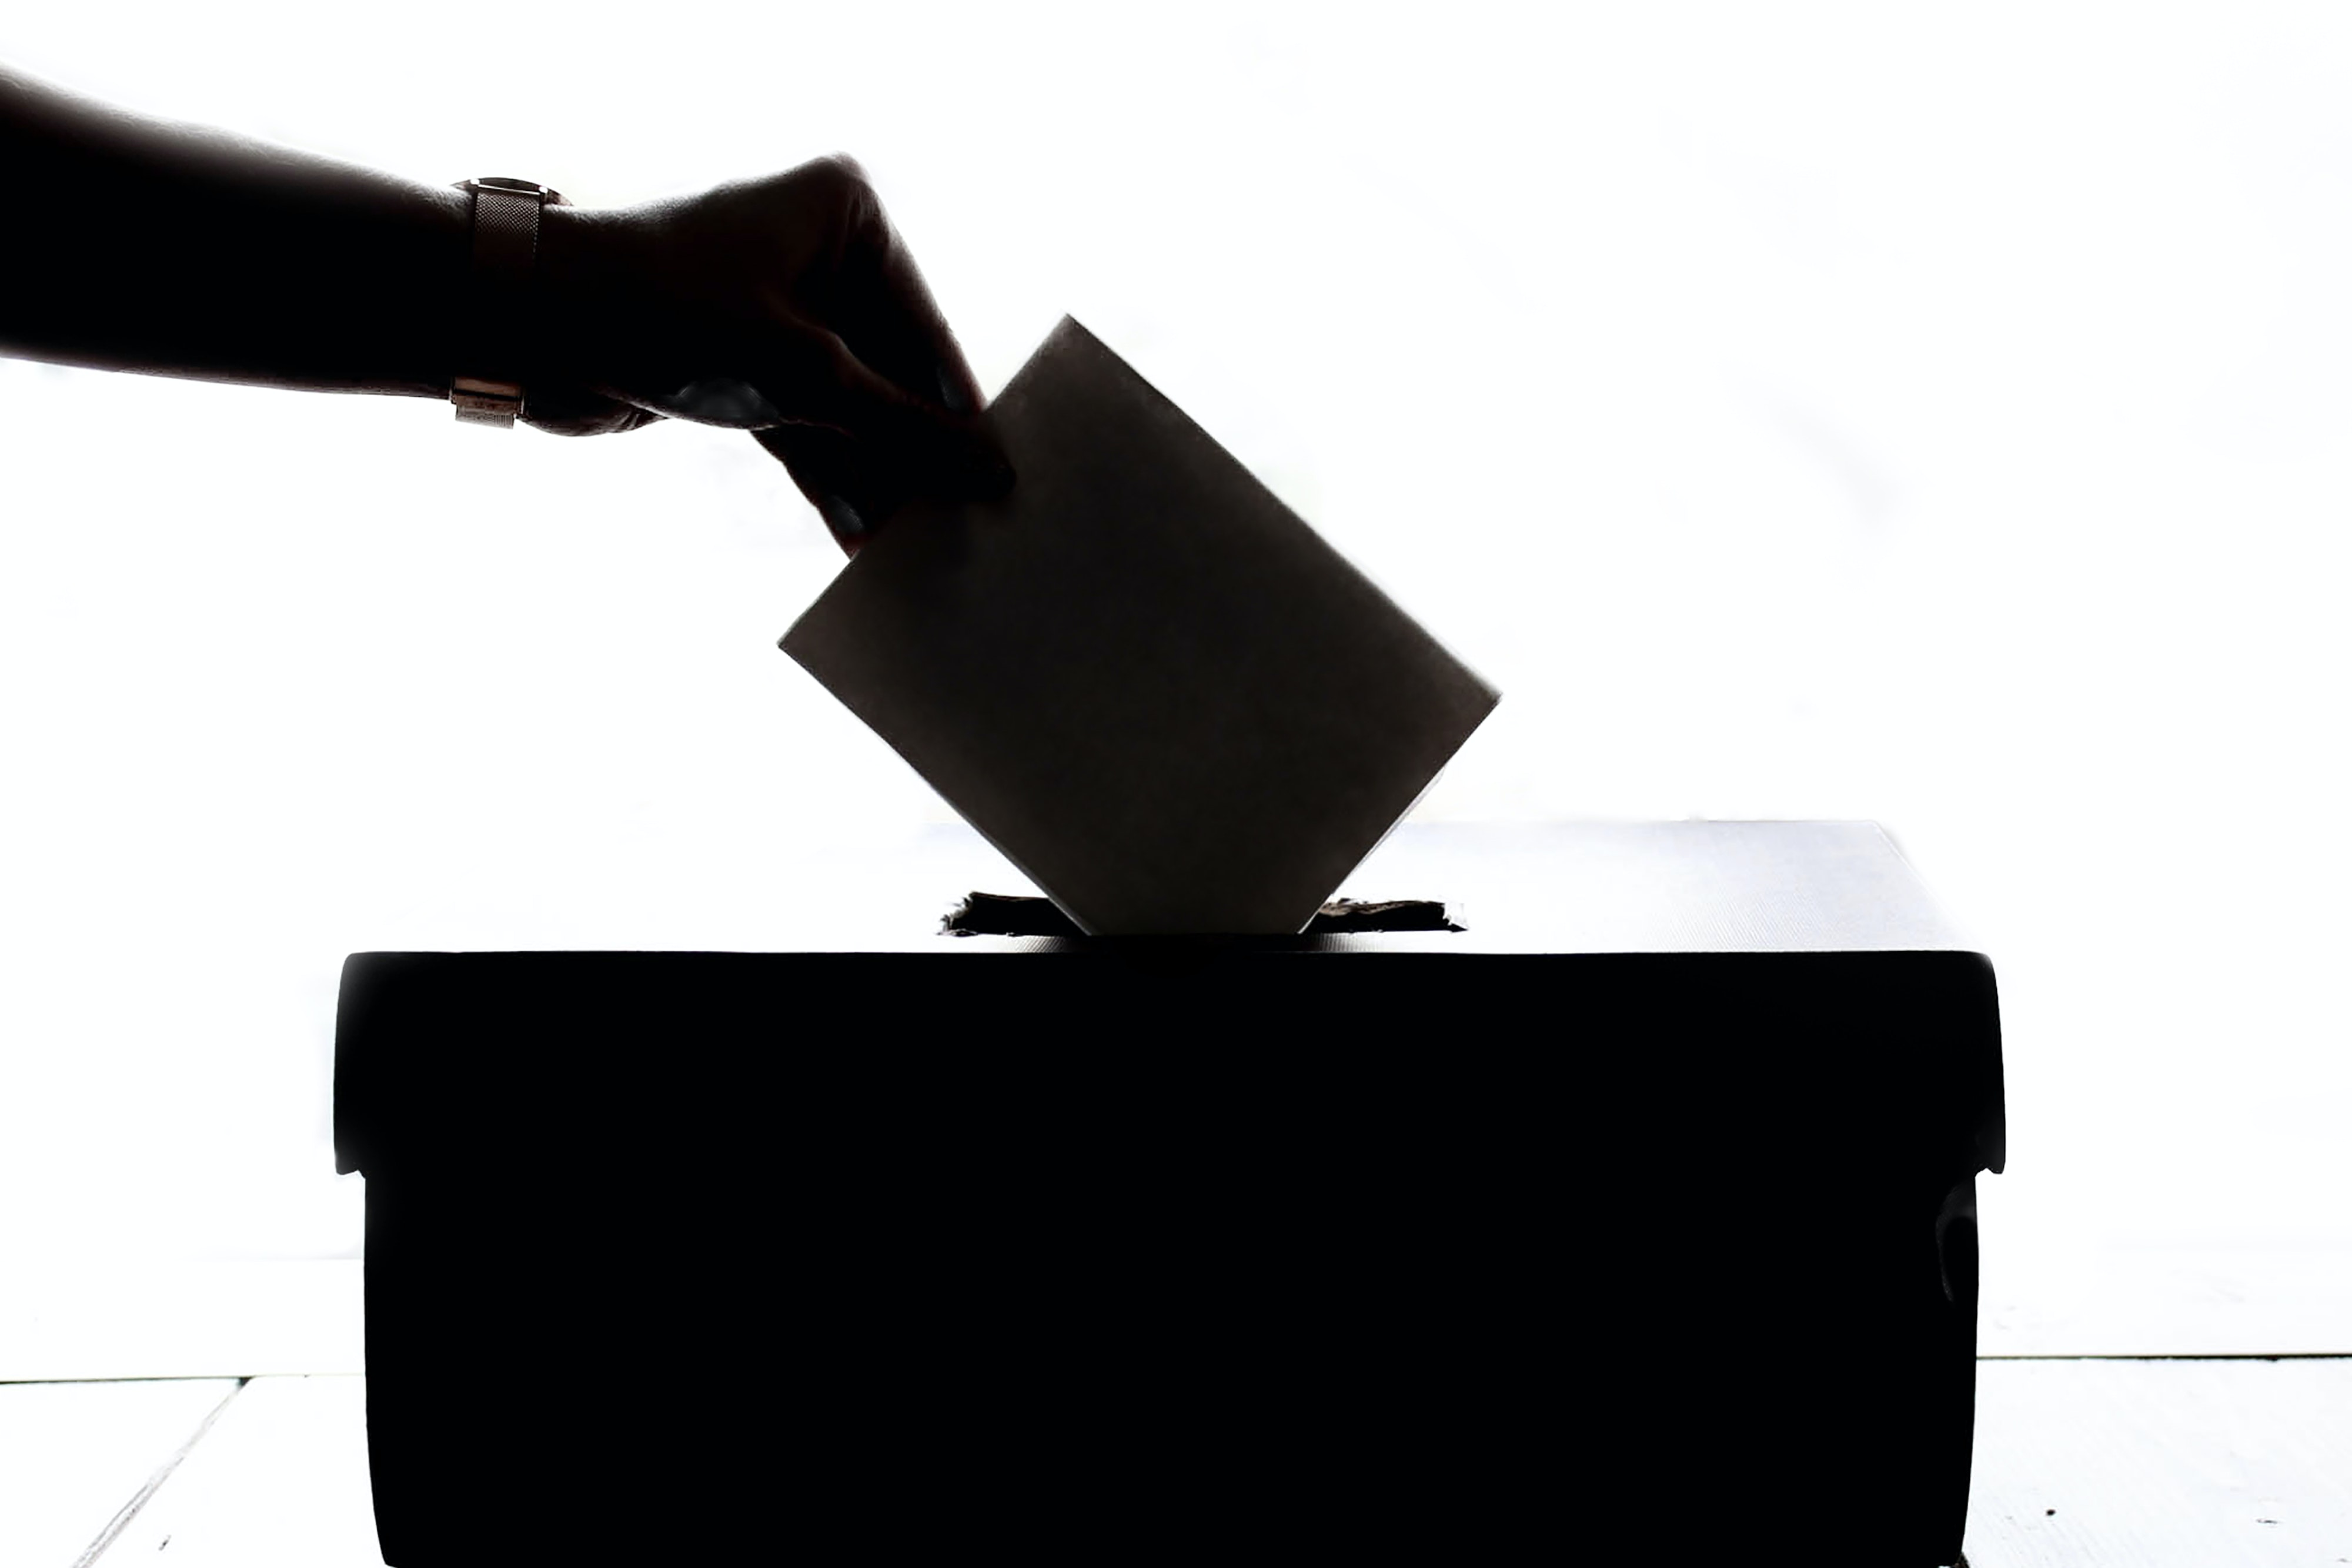 photo_elections_1_pexels.jpg